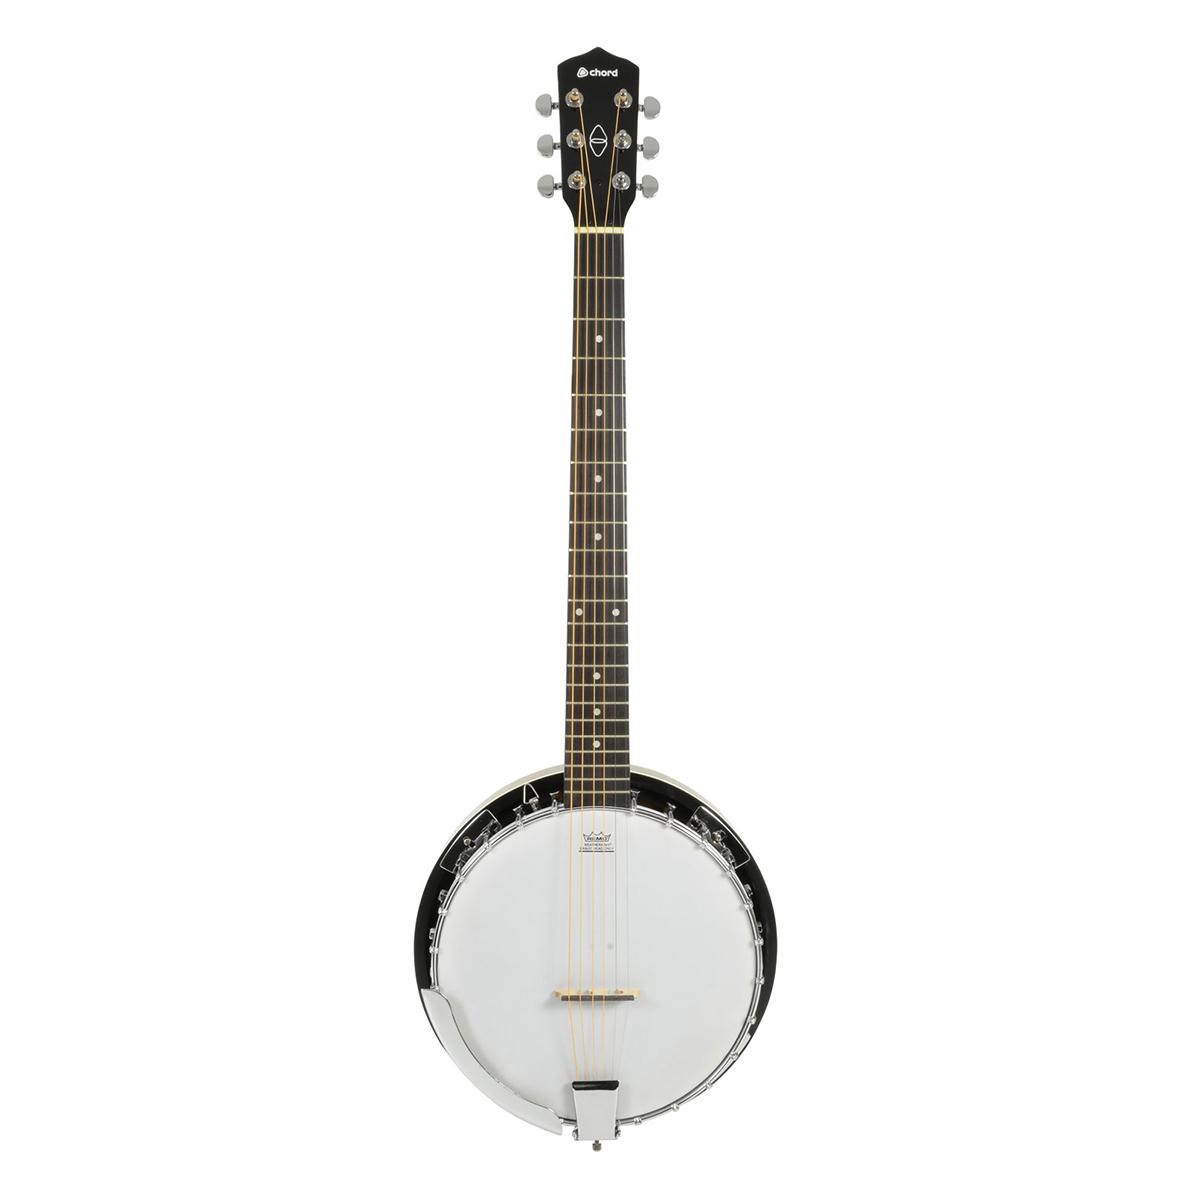 Chord 6 String Banjo